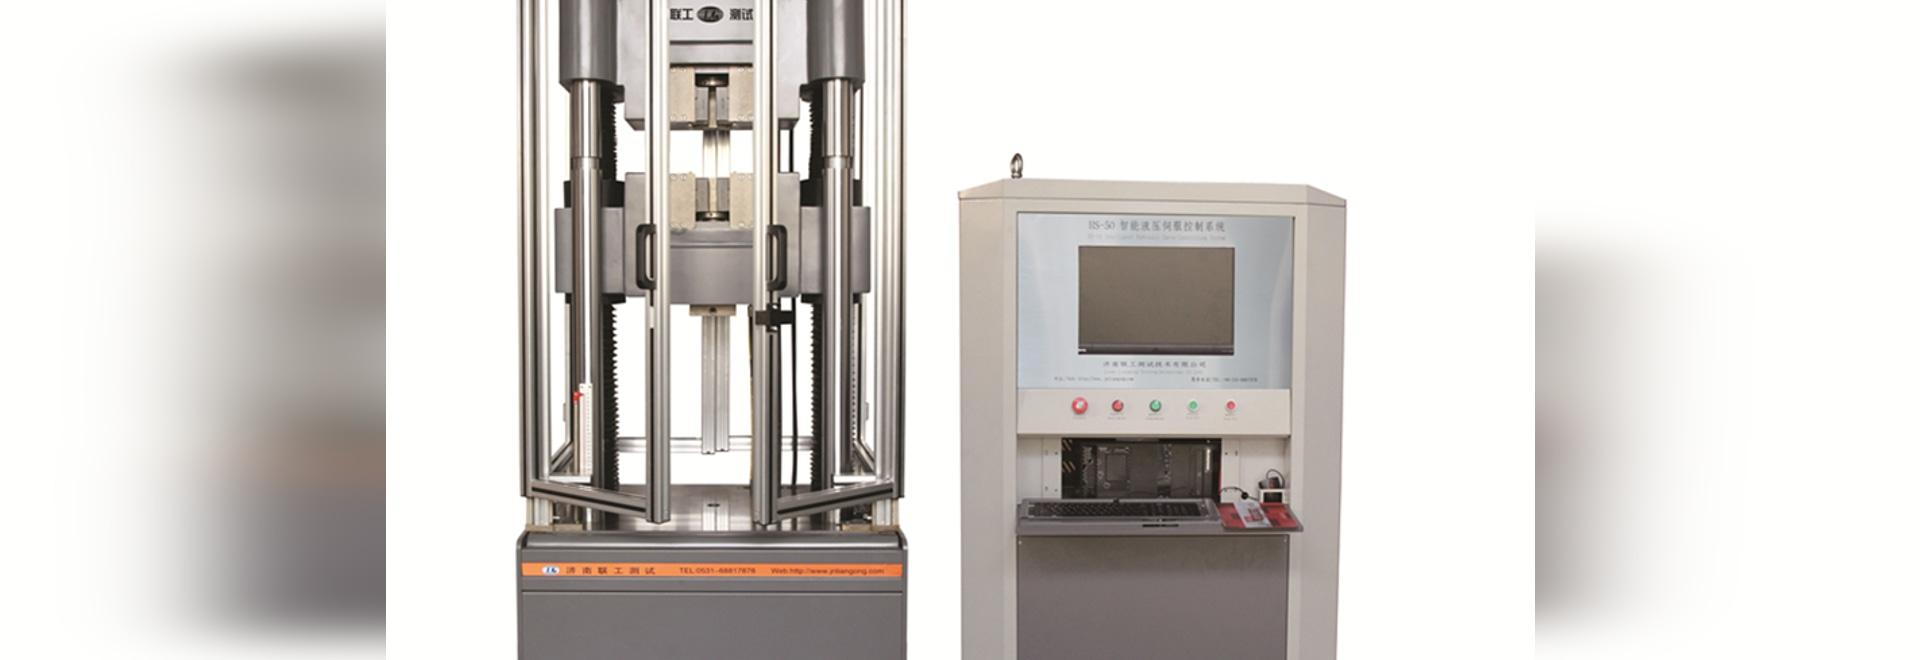 WAW-E Series Computer Control Electro-hydraulic Servo Universal Testing Machine